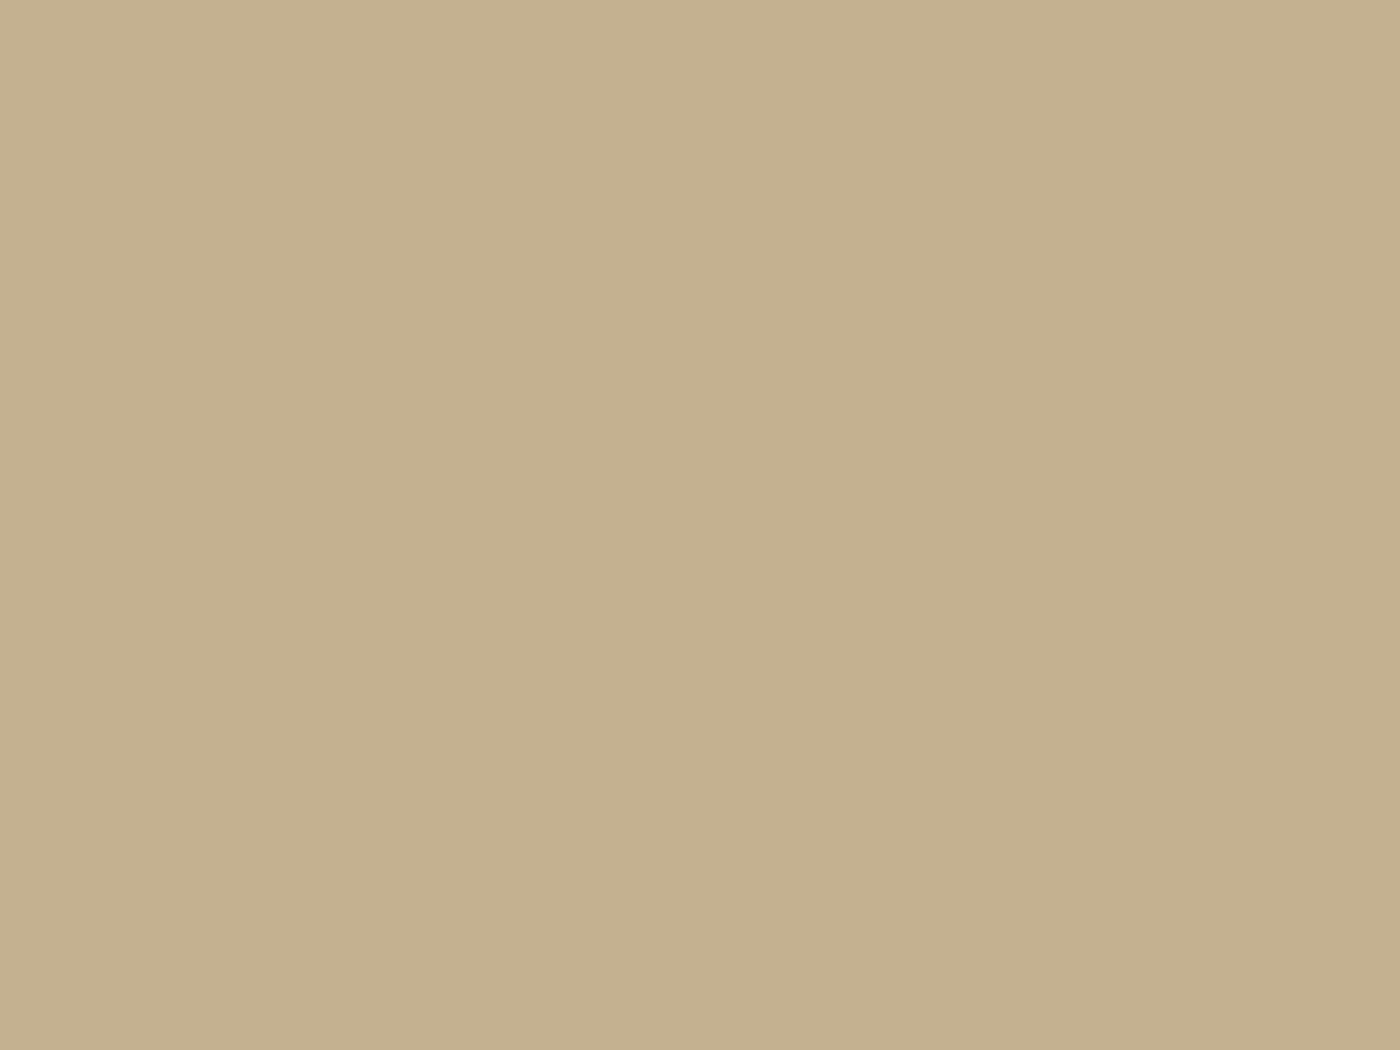 1400x1050 Khaki Web Solid Color Background